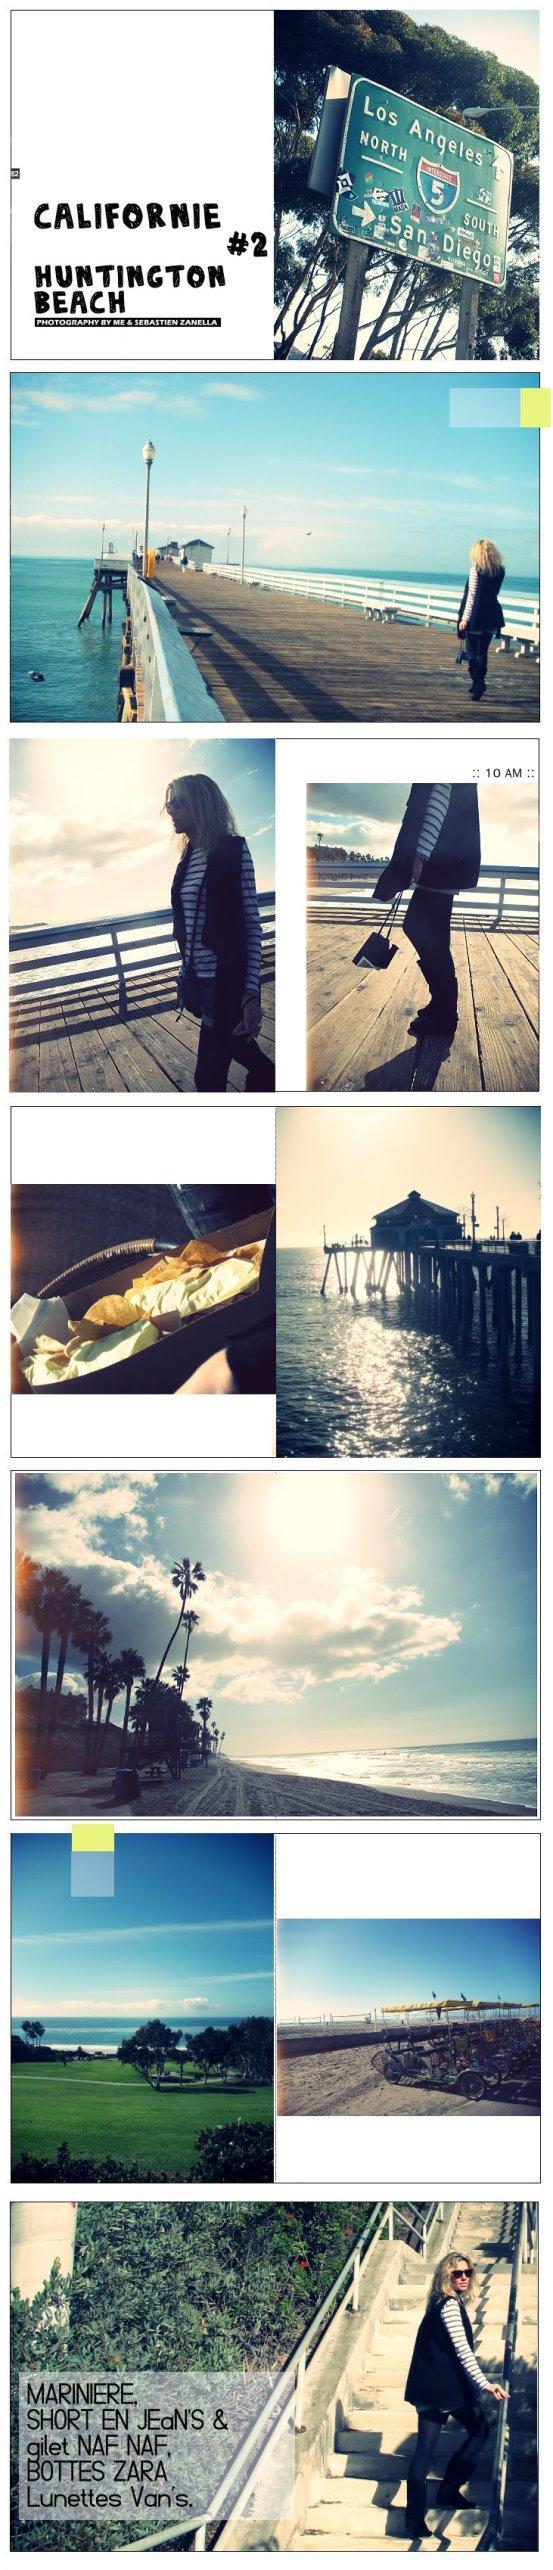 CALIFORNIE Huntington Beach #2S